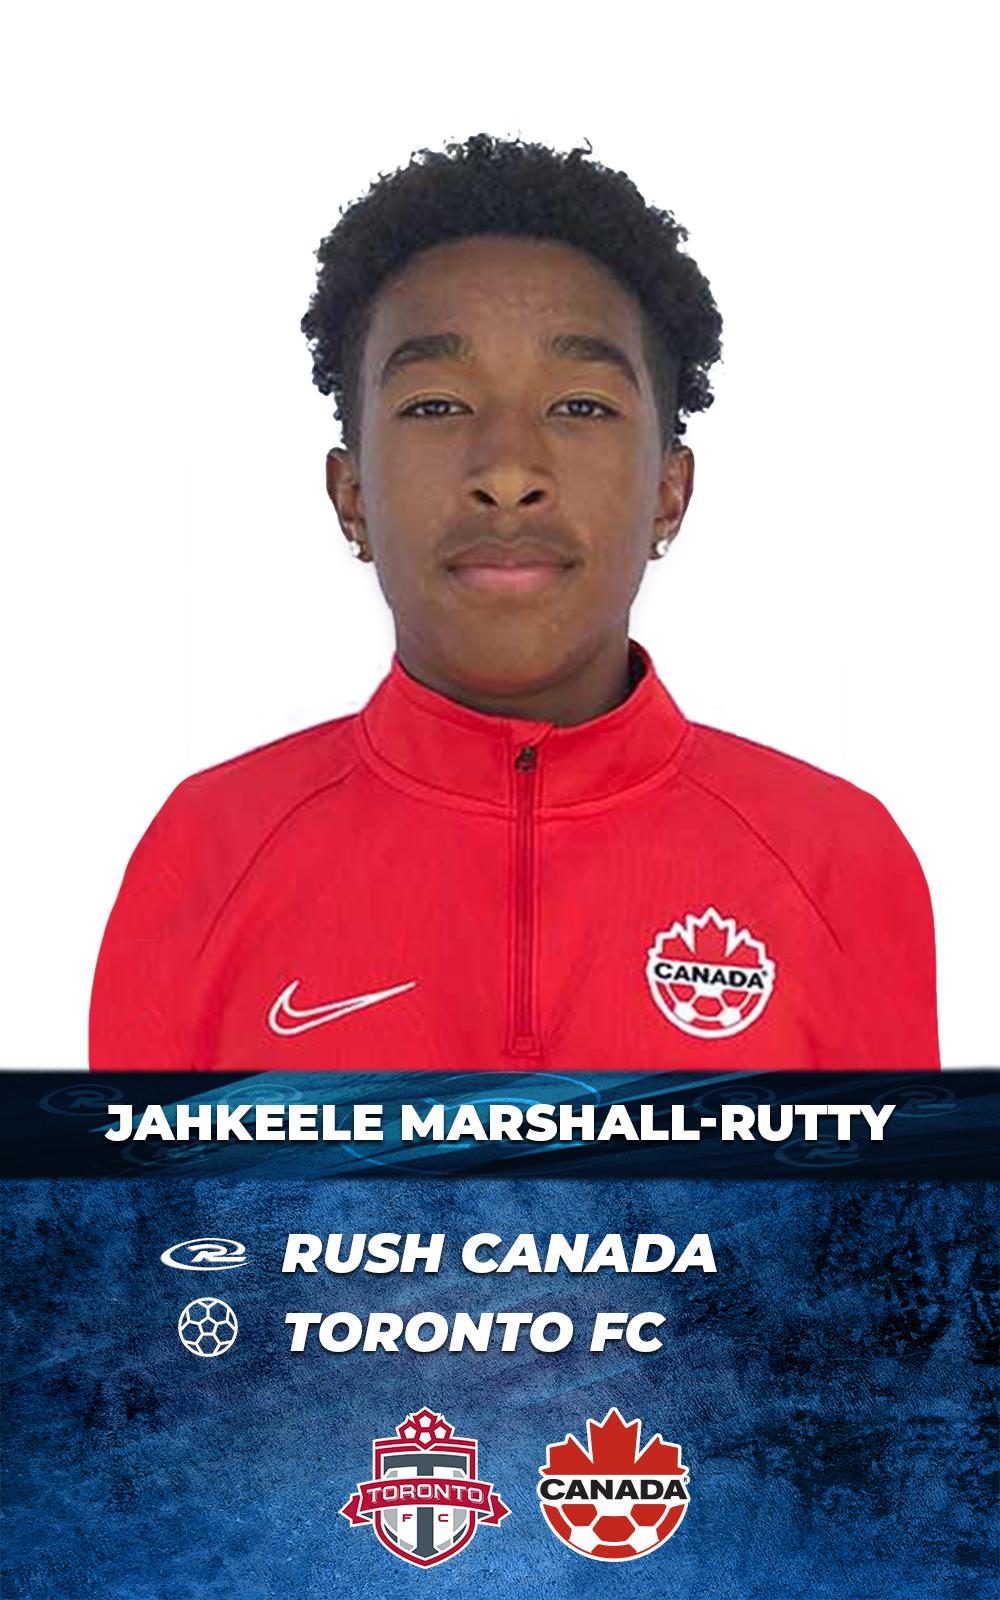 JAHKEELE-MARSHALL-RUTTY